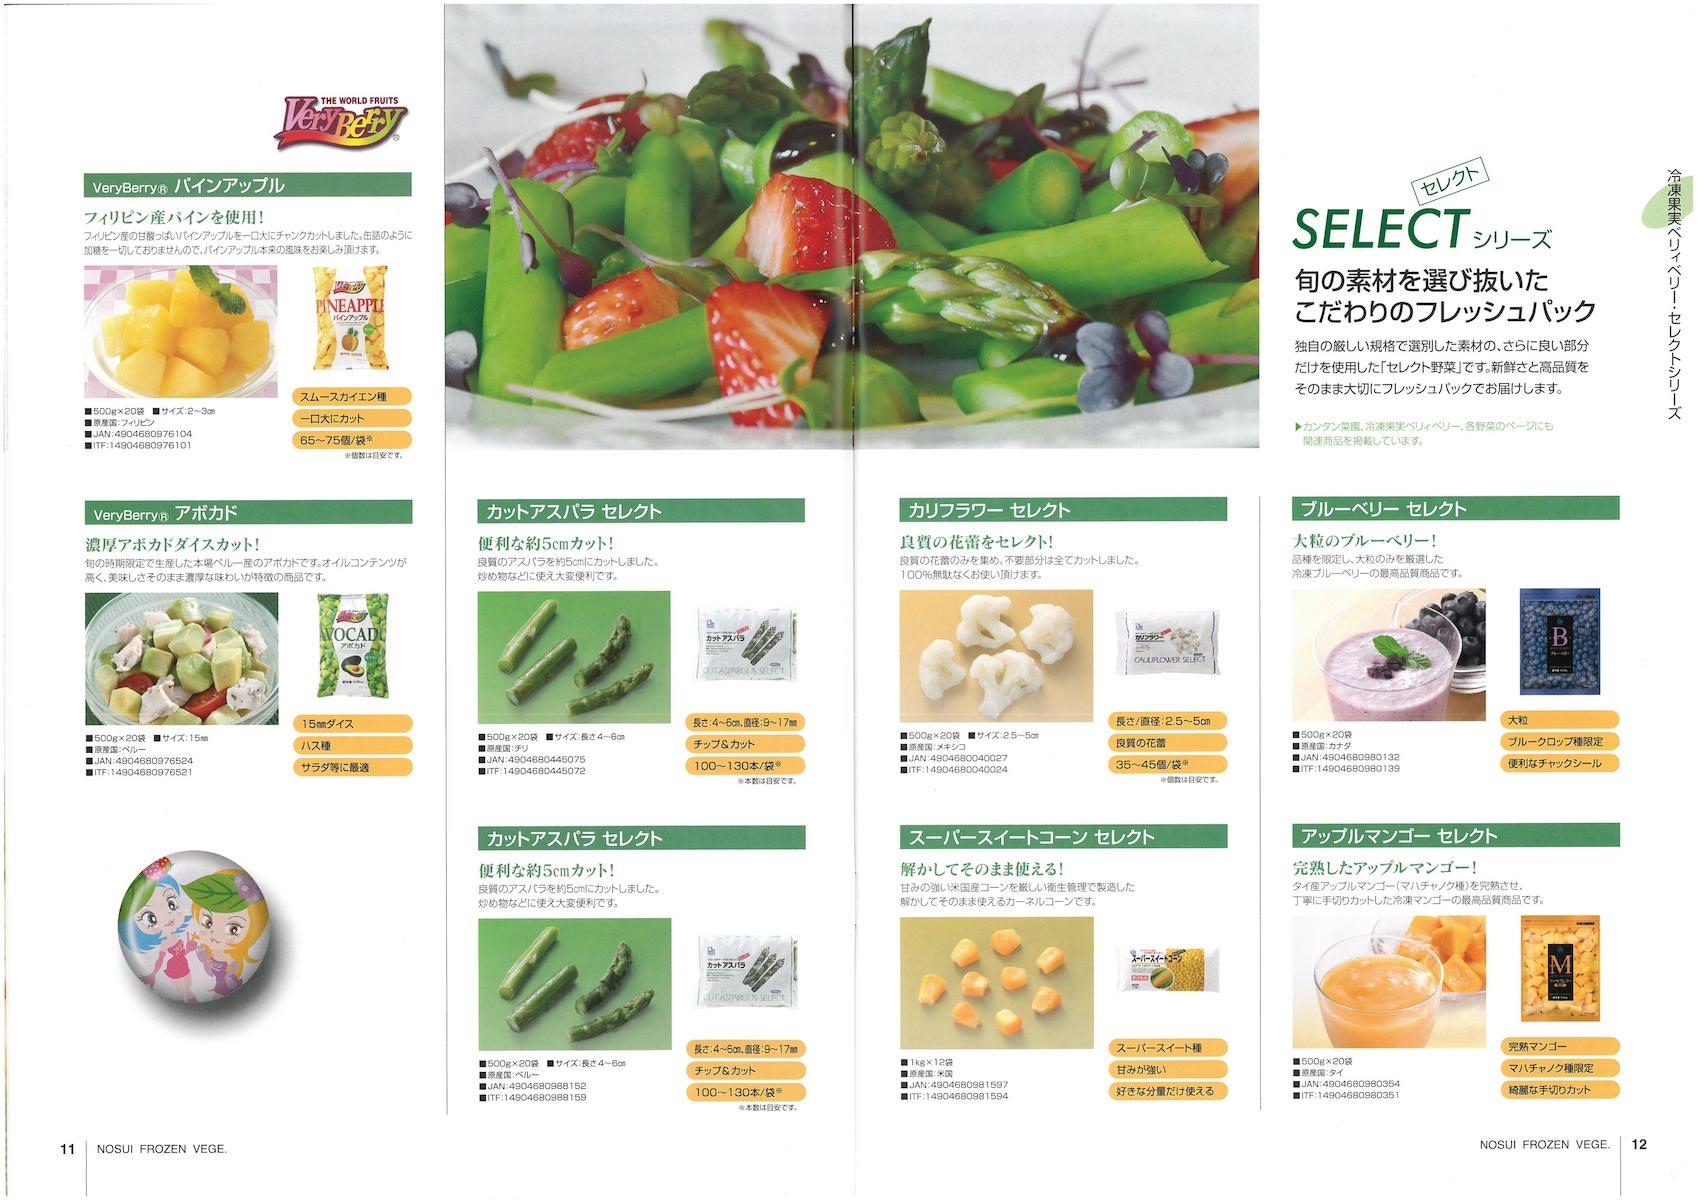 ノースイ 冷凍野菜・果物 調理食品